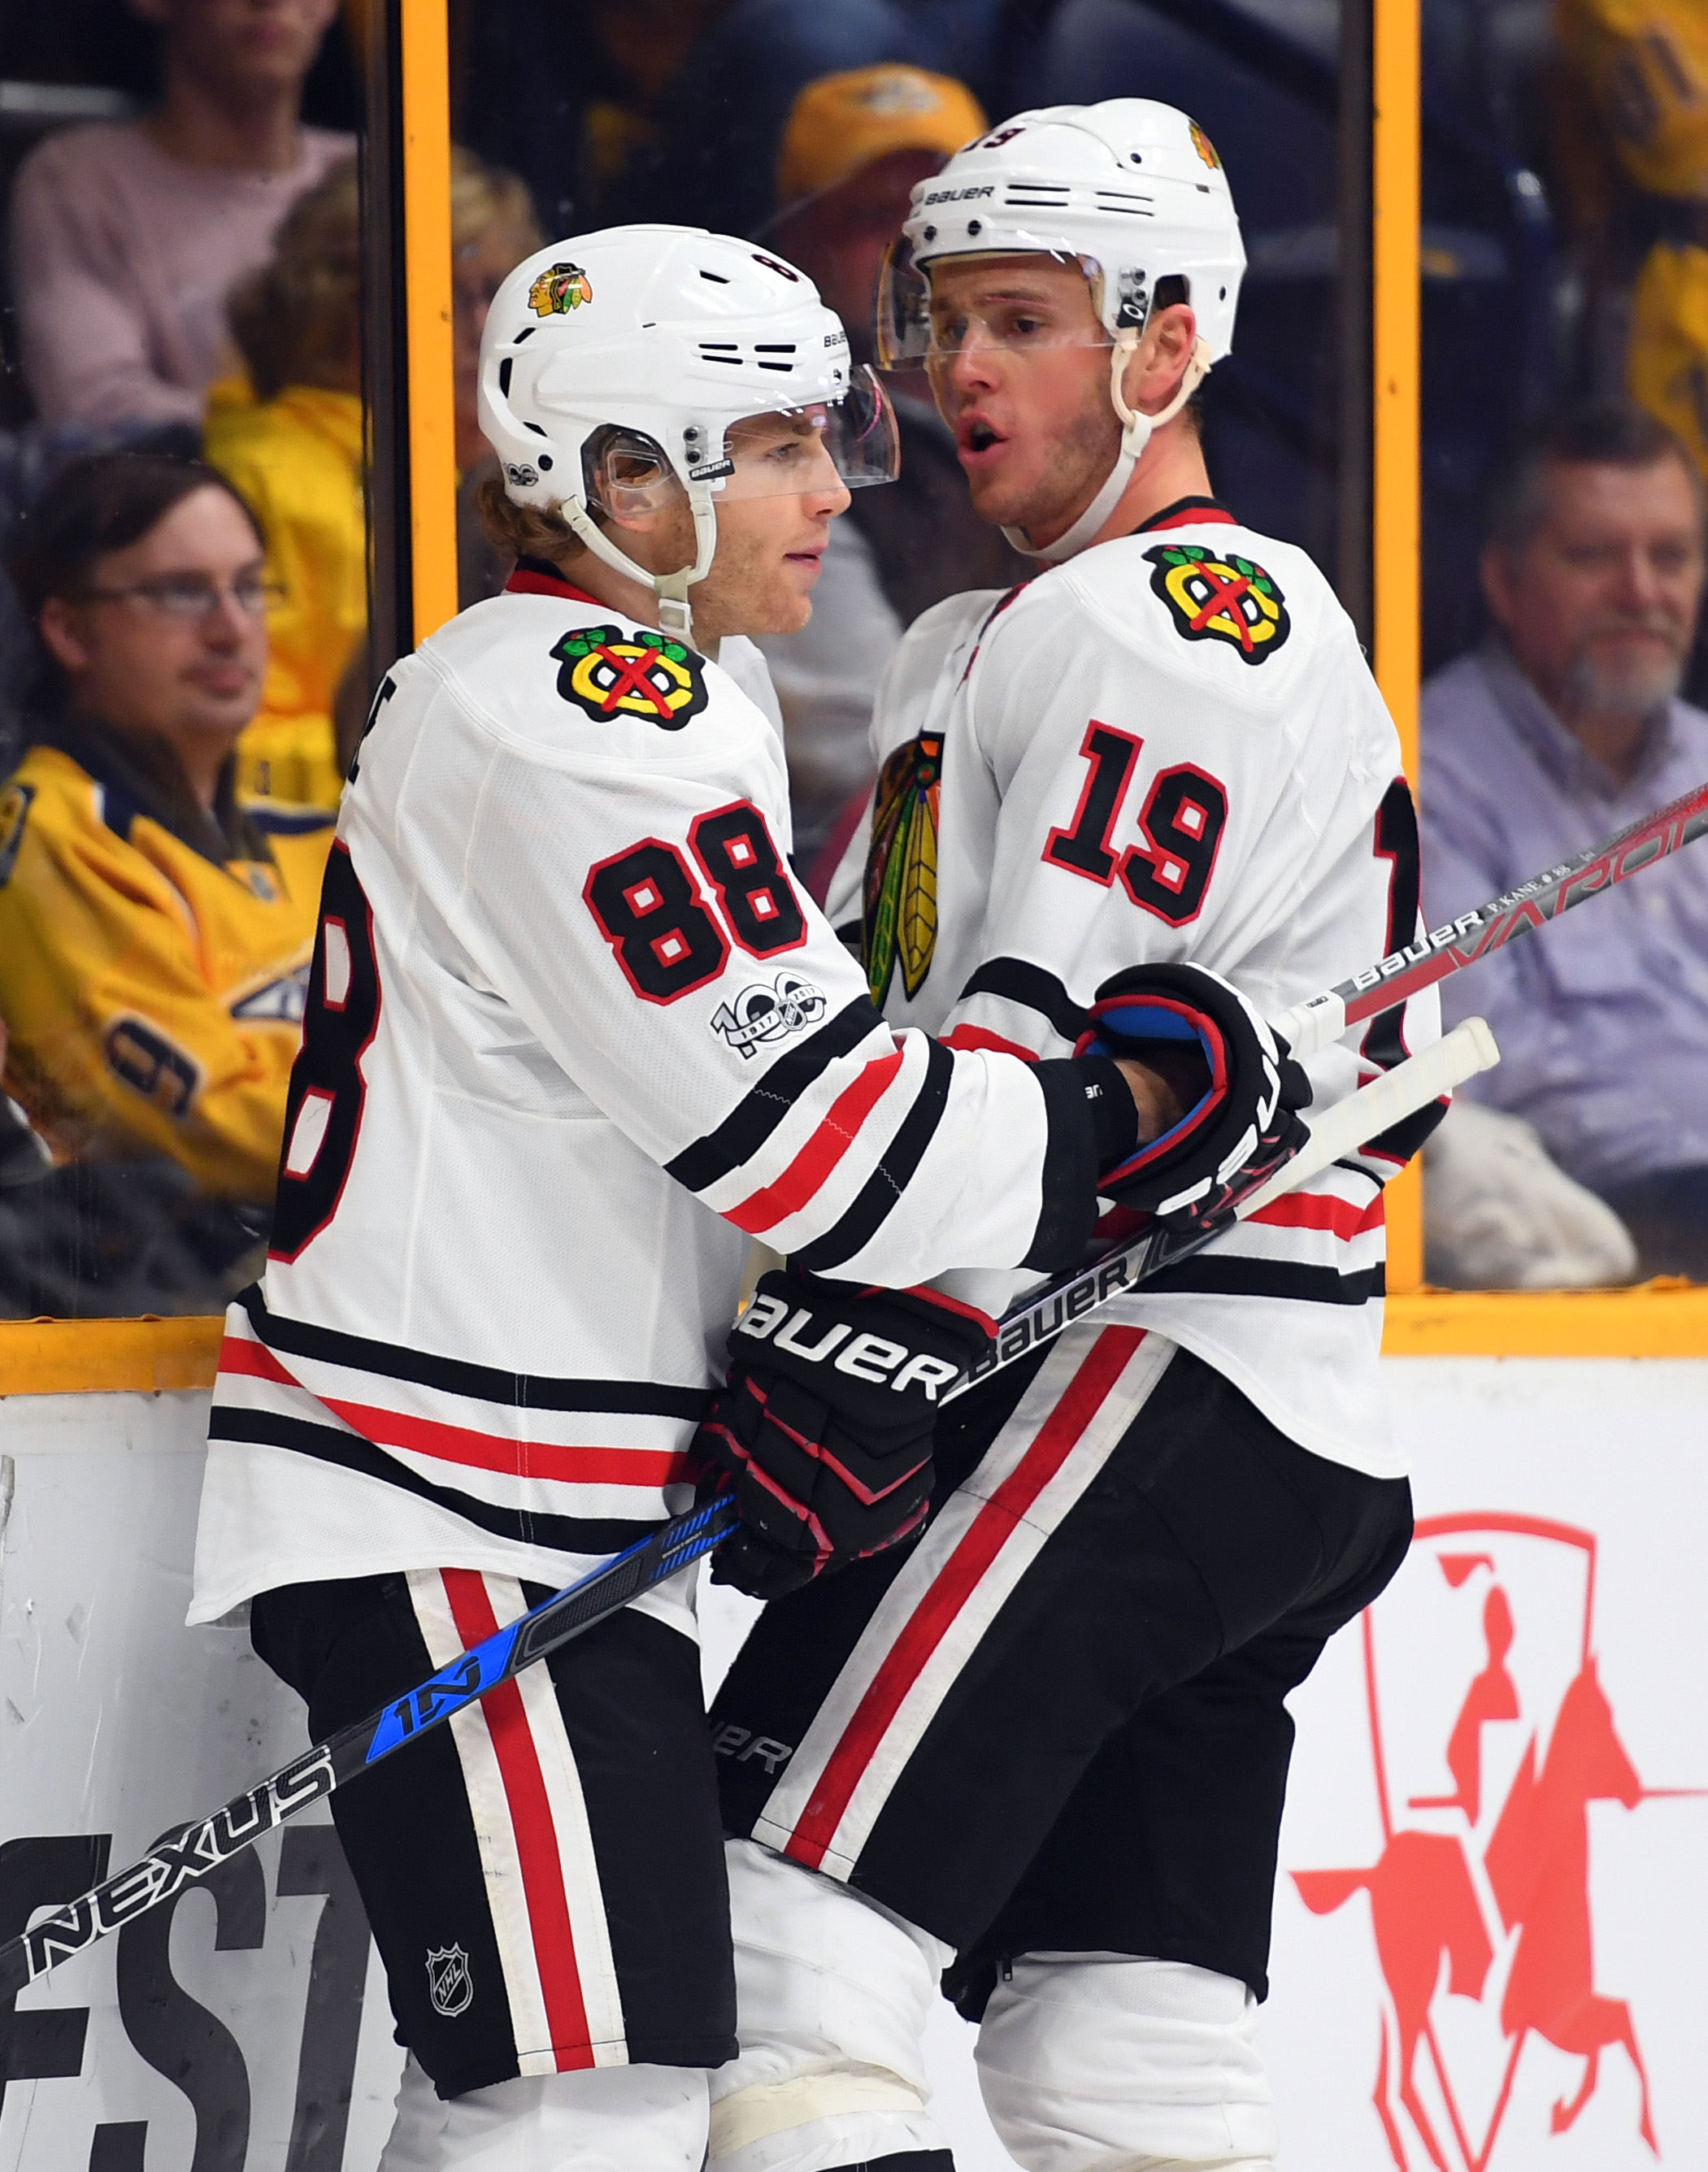 9917964-nhl-chicago-blackhawks-at-nashville-predators